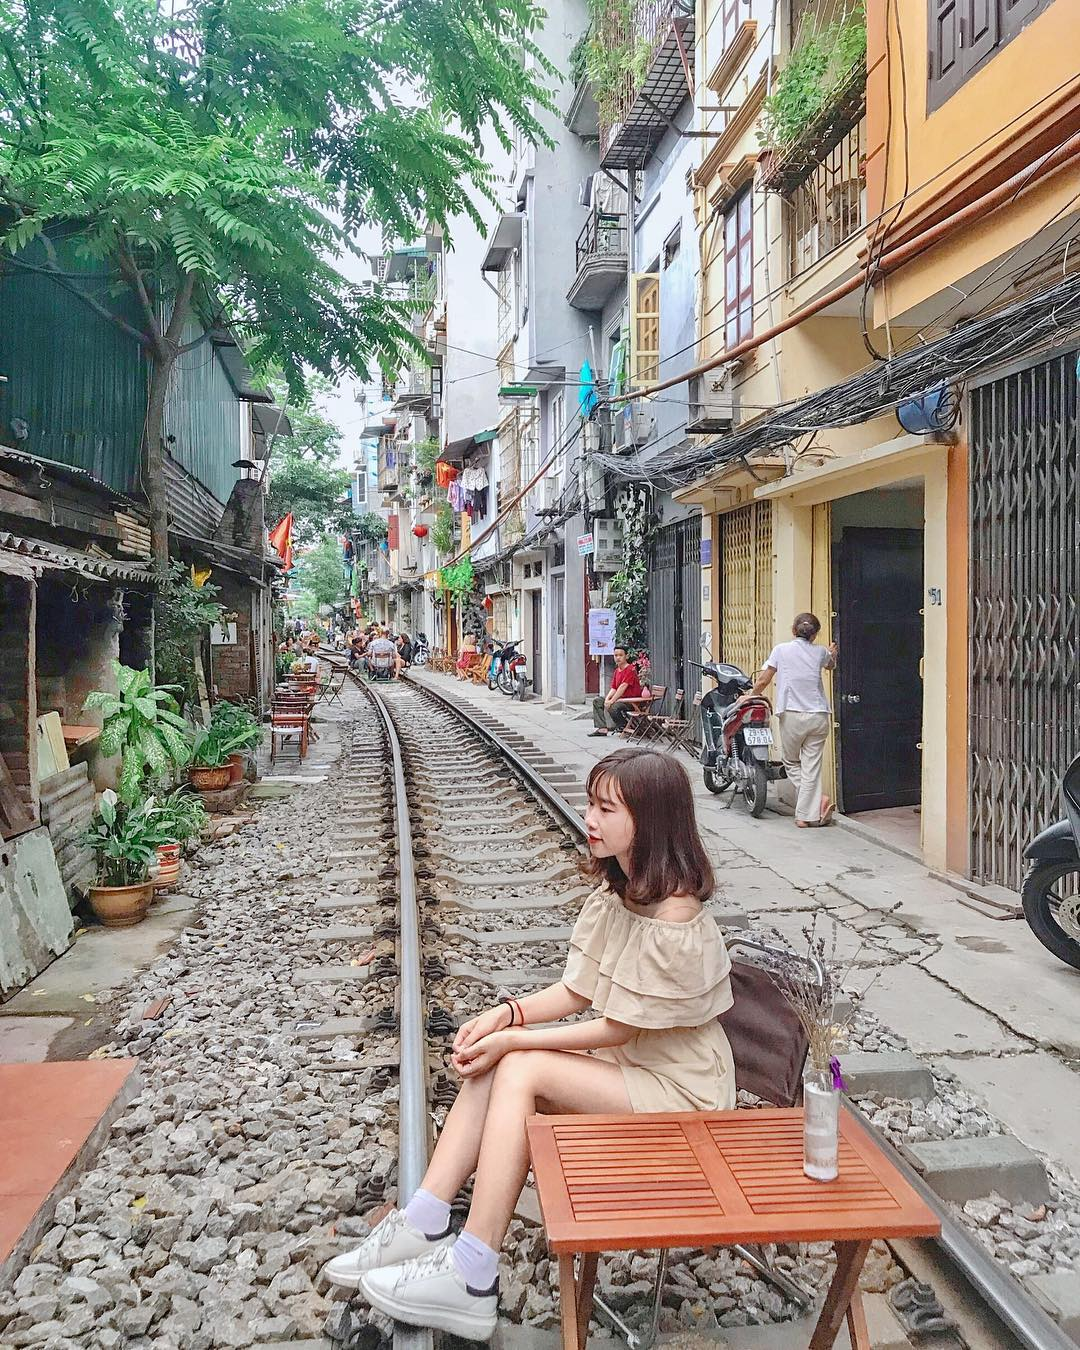 hanoi_xom-cafe-duong-tau-ha-noi-06